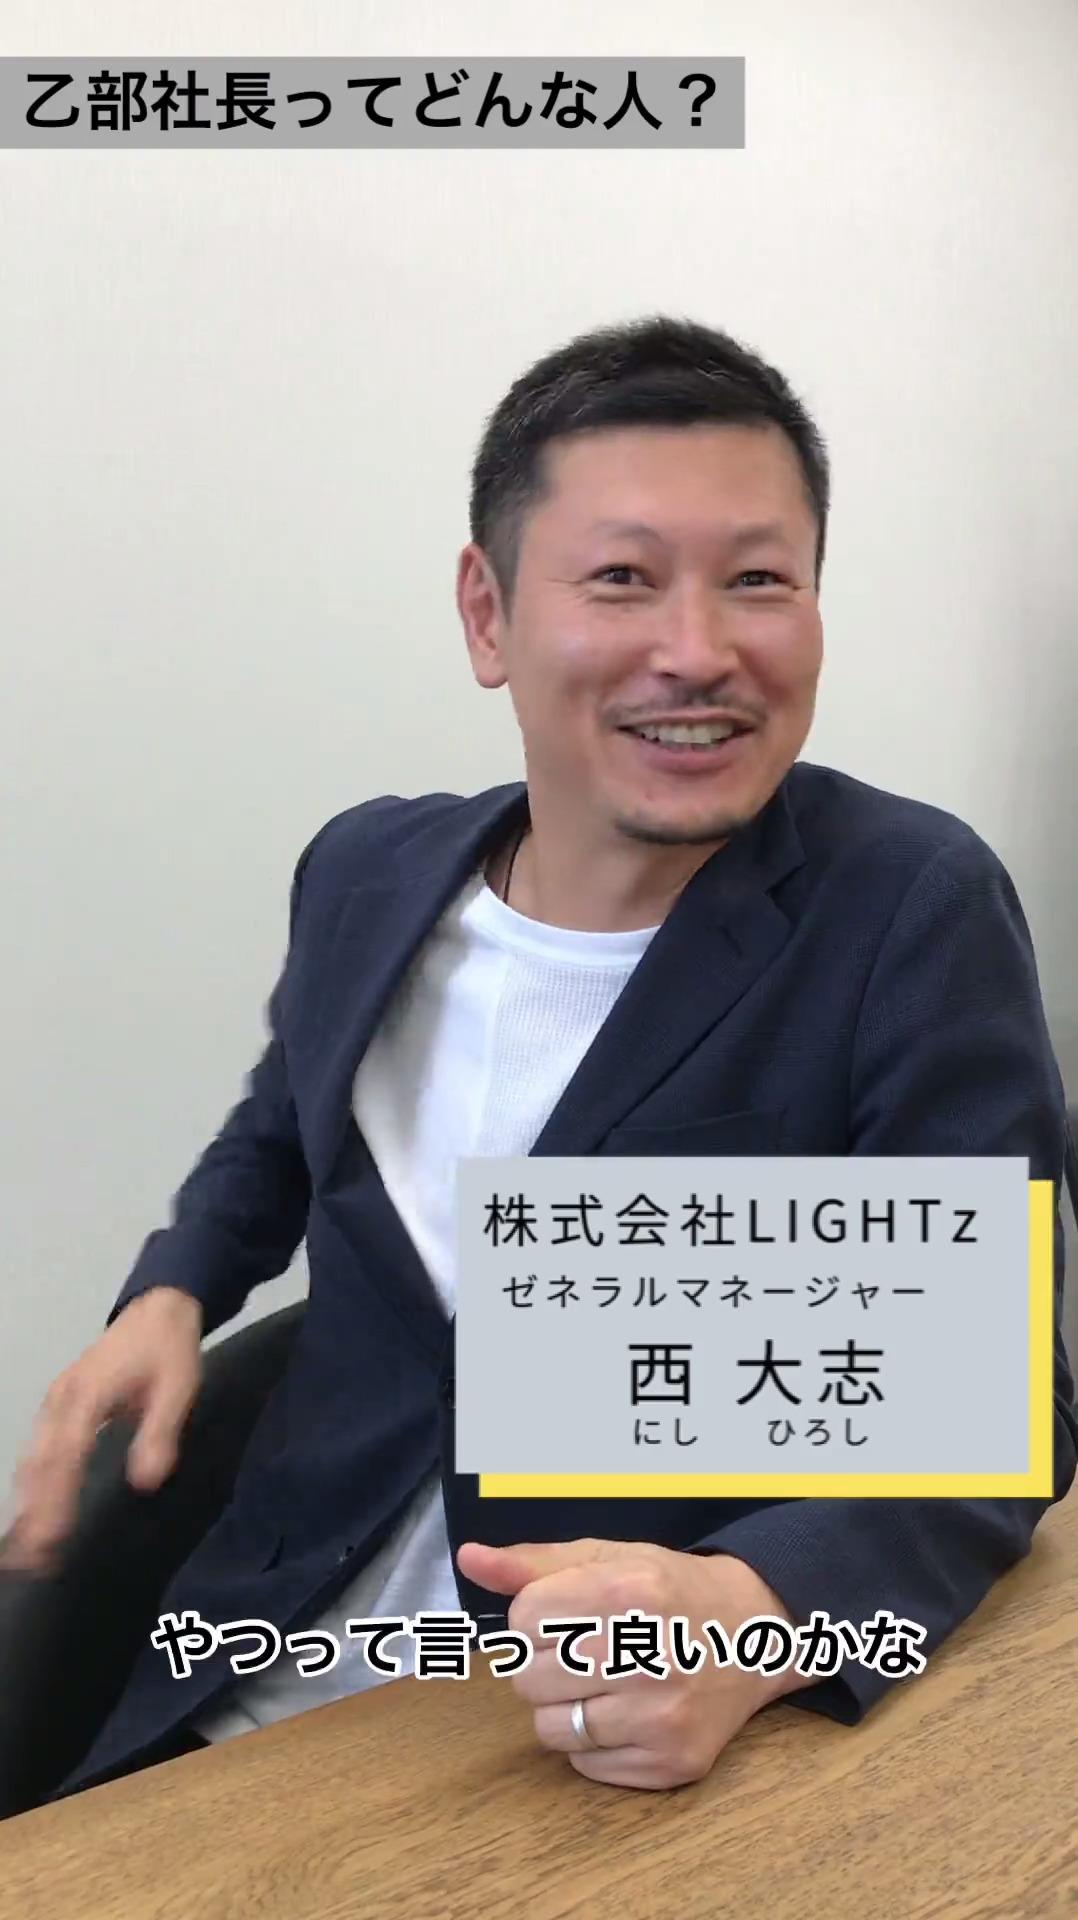 GM西さんが語るLIGHTz社長の素顔とは?【採用動画】